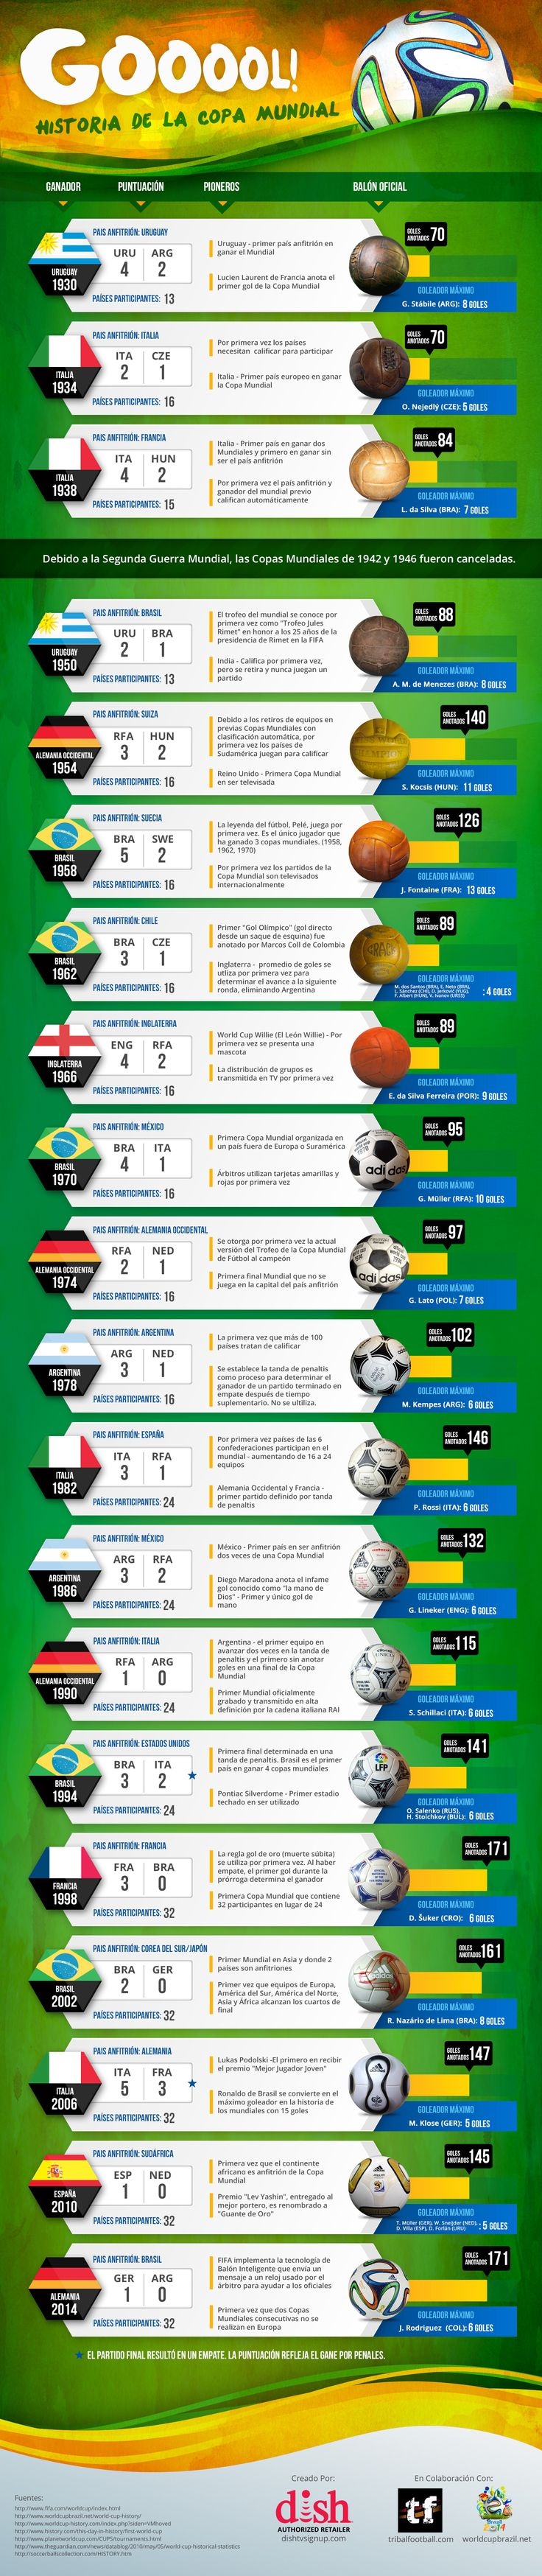 Historia del Mundial de fútbol #infografia, vía infografiasencastellano.com; de Alfredo Vela